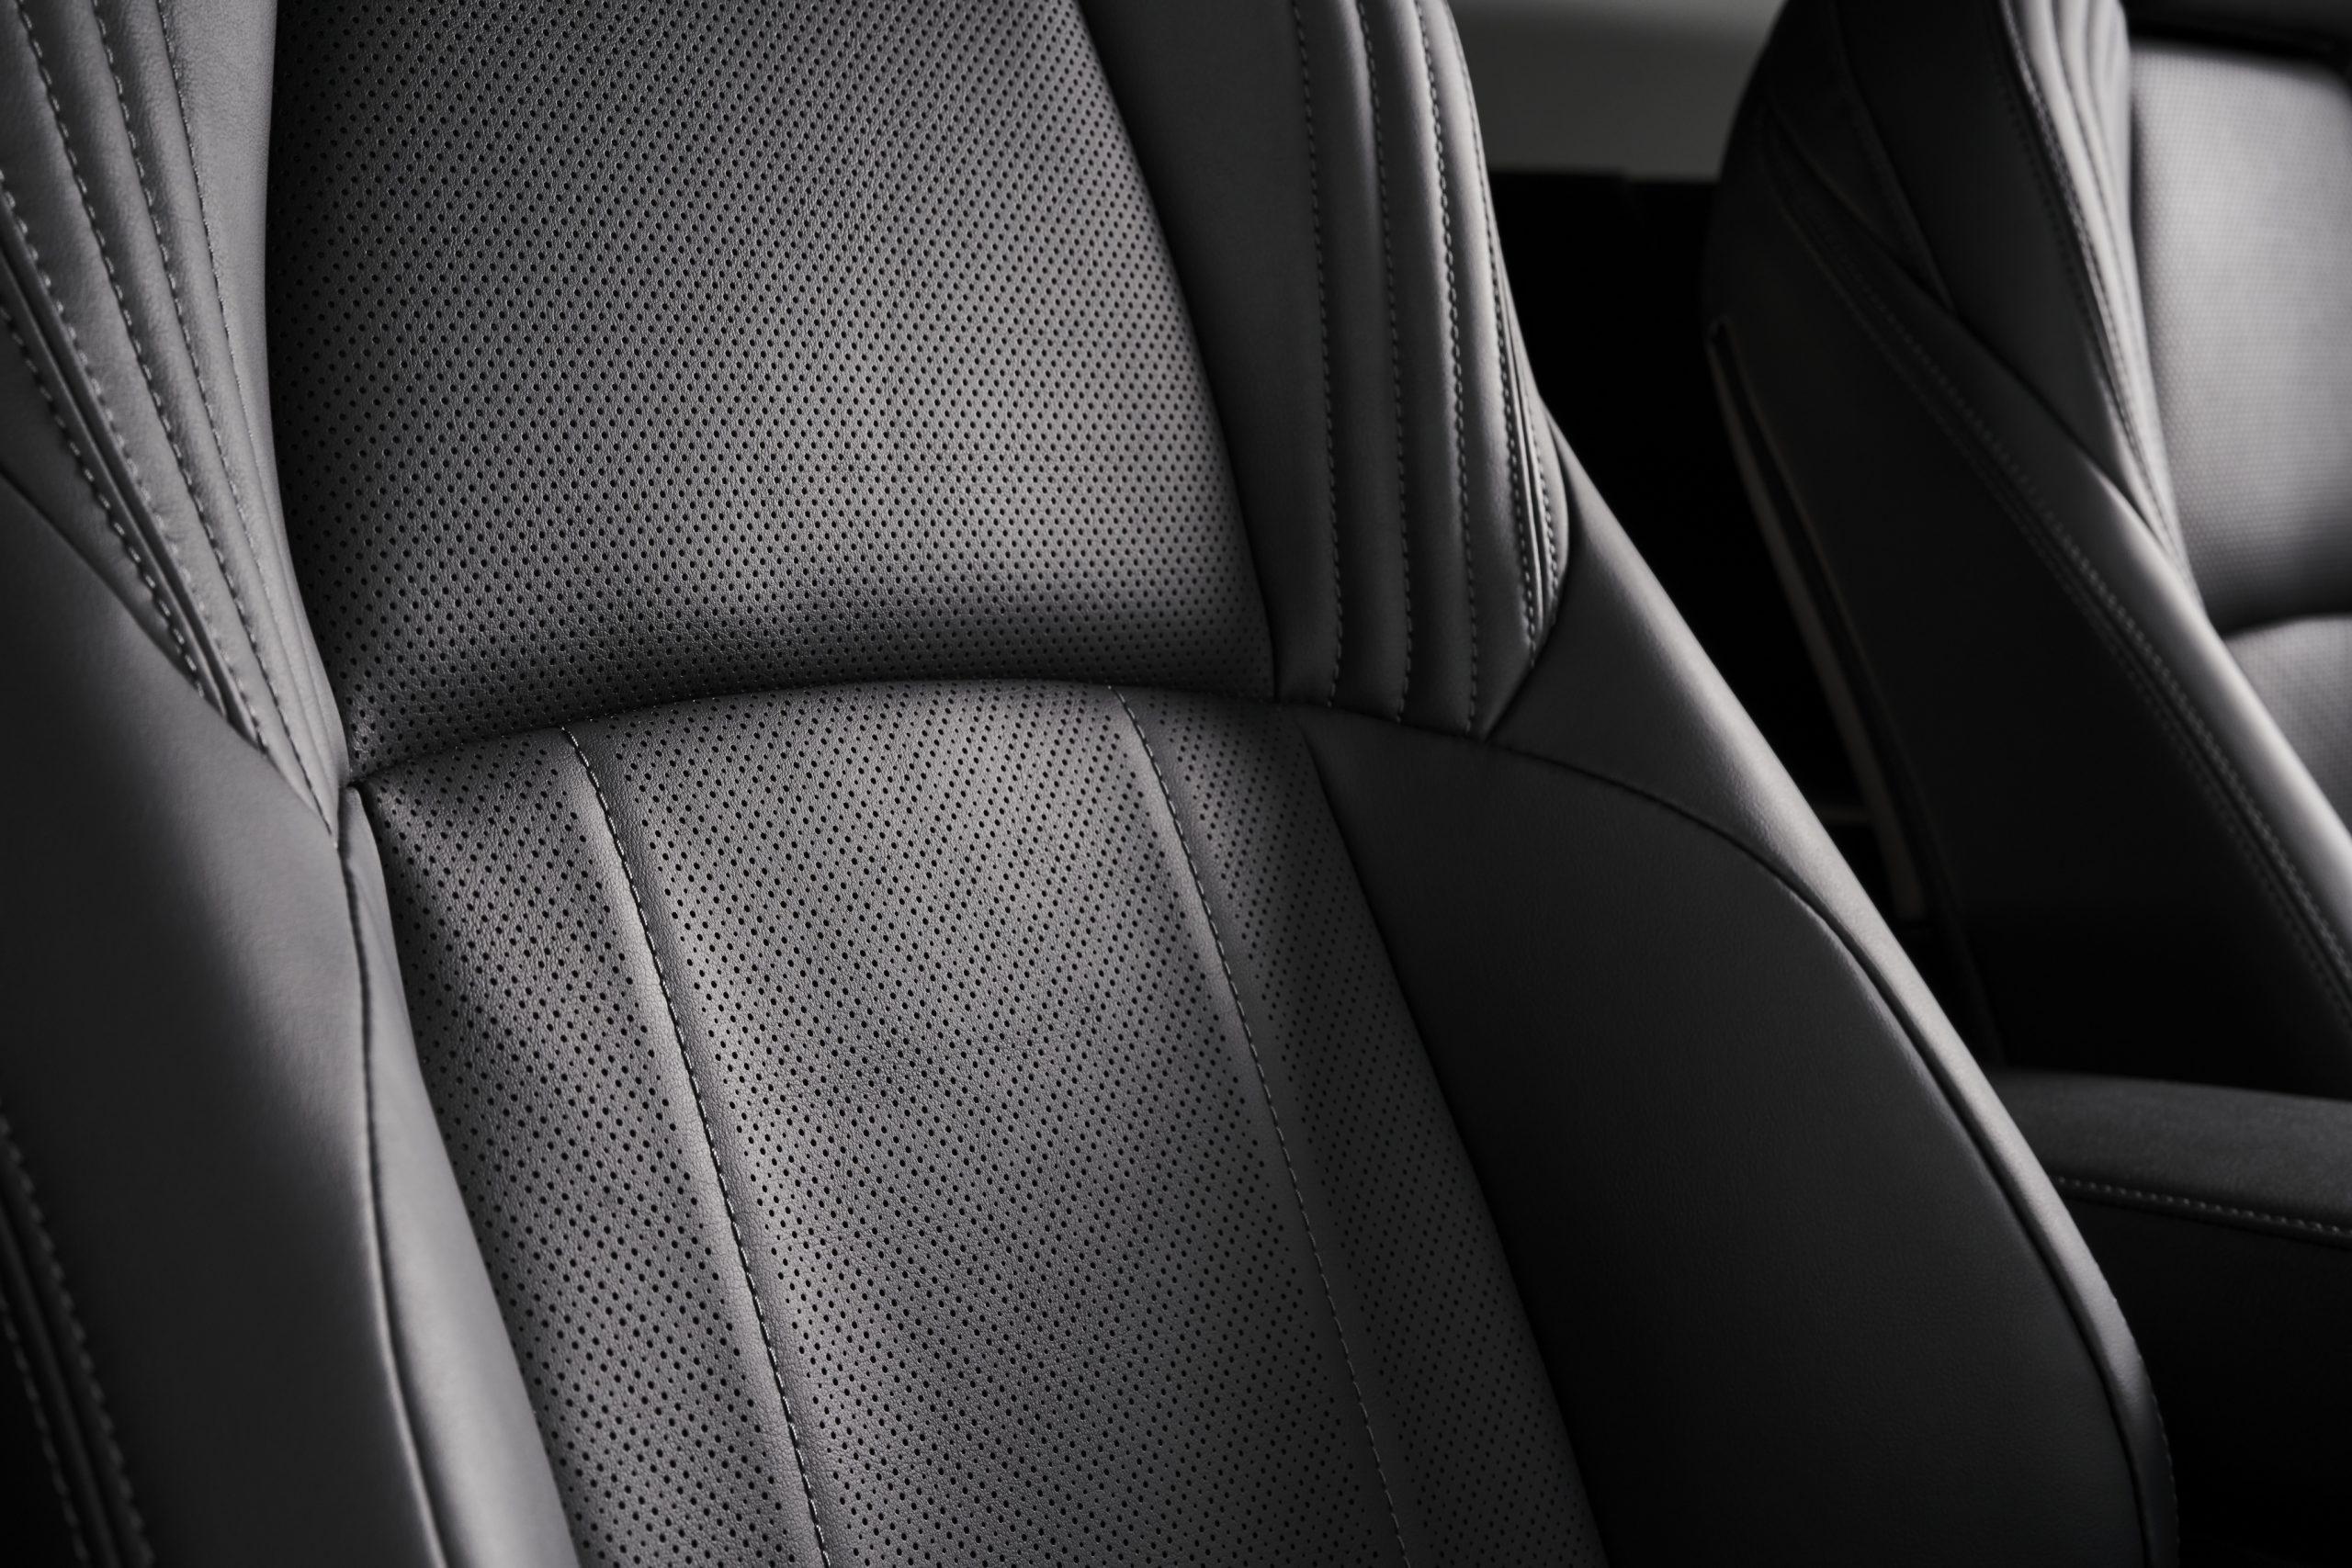 2021-Toyota-Venza_Interior_008-scaled.jpg